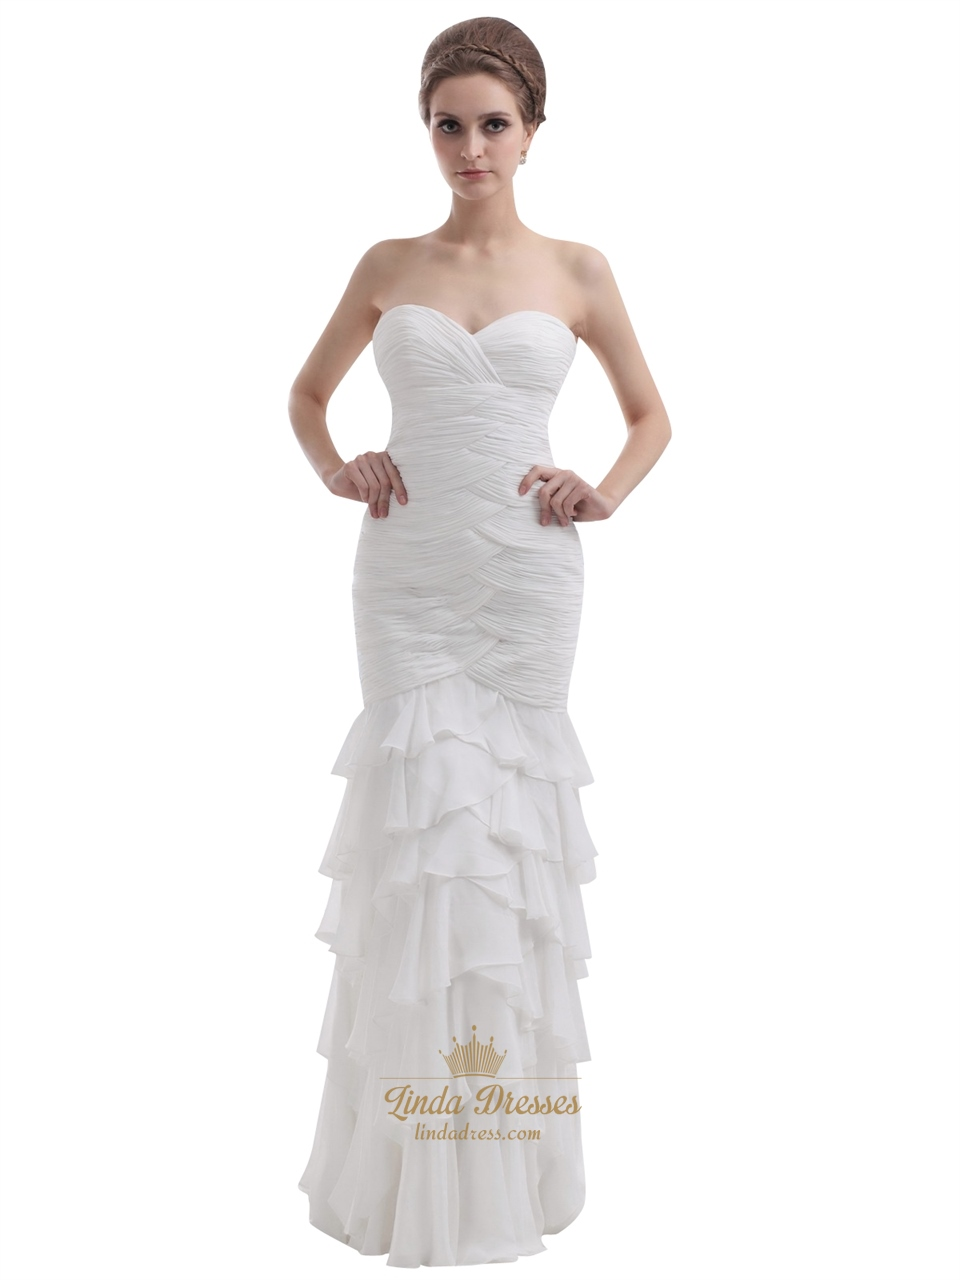 Ivory strapless sweetheart chiffon mermaid wedding dress for Ivory strapless wedding dress